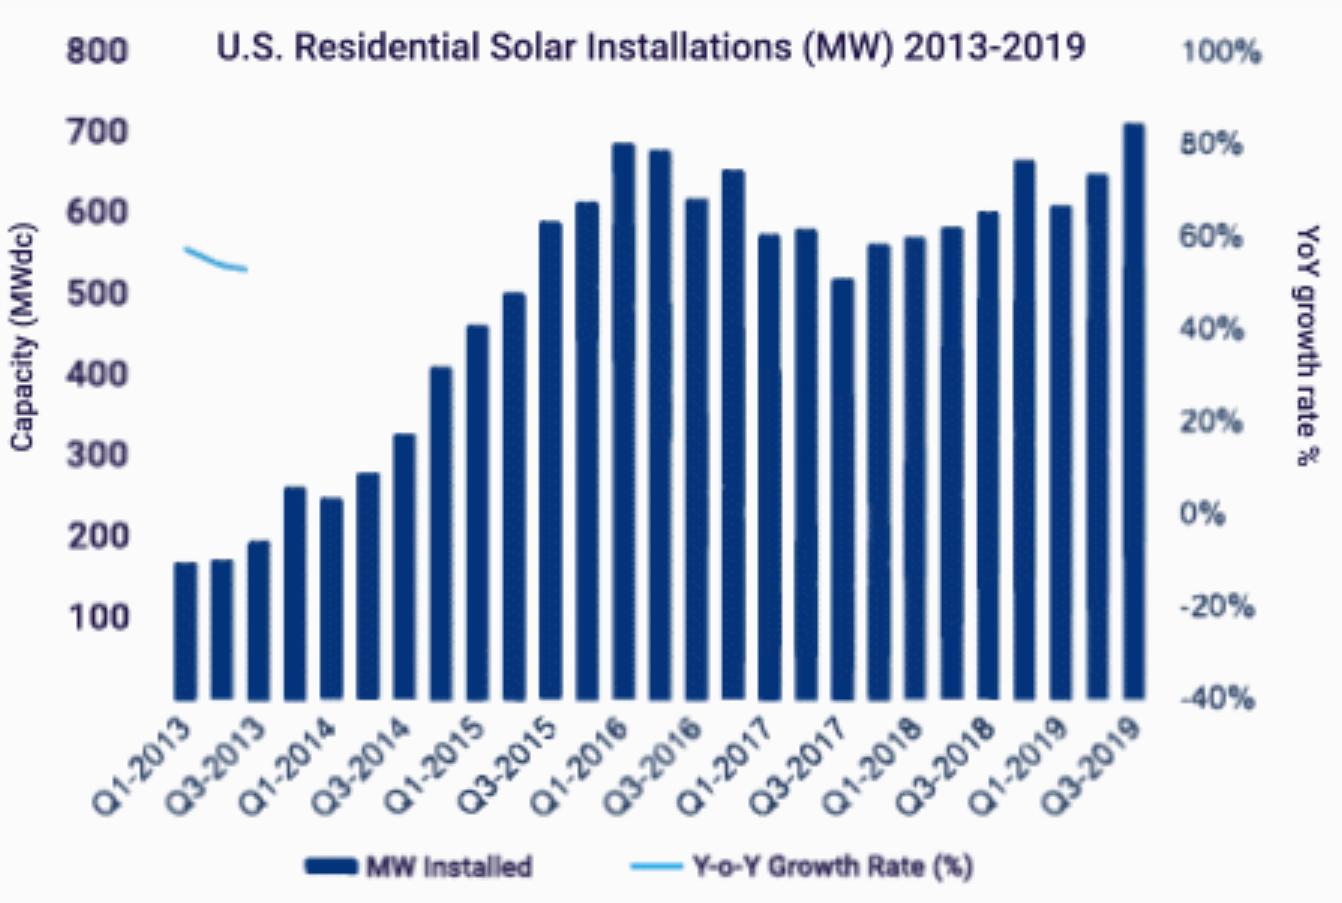 U.S. Residential Solar Installations Graph